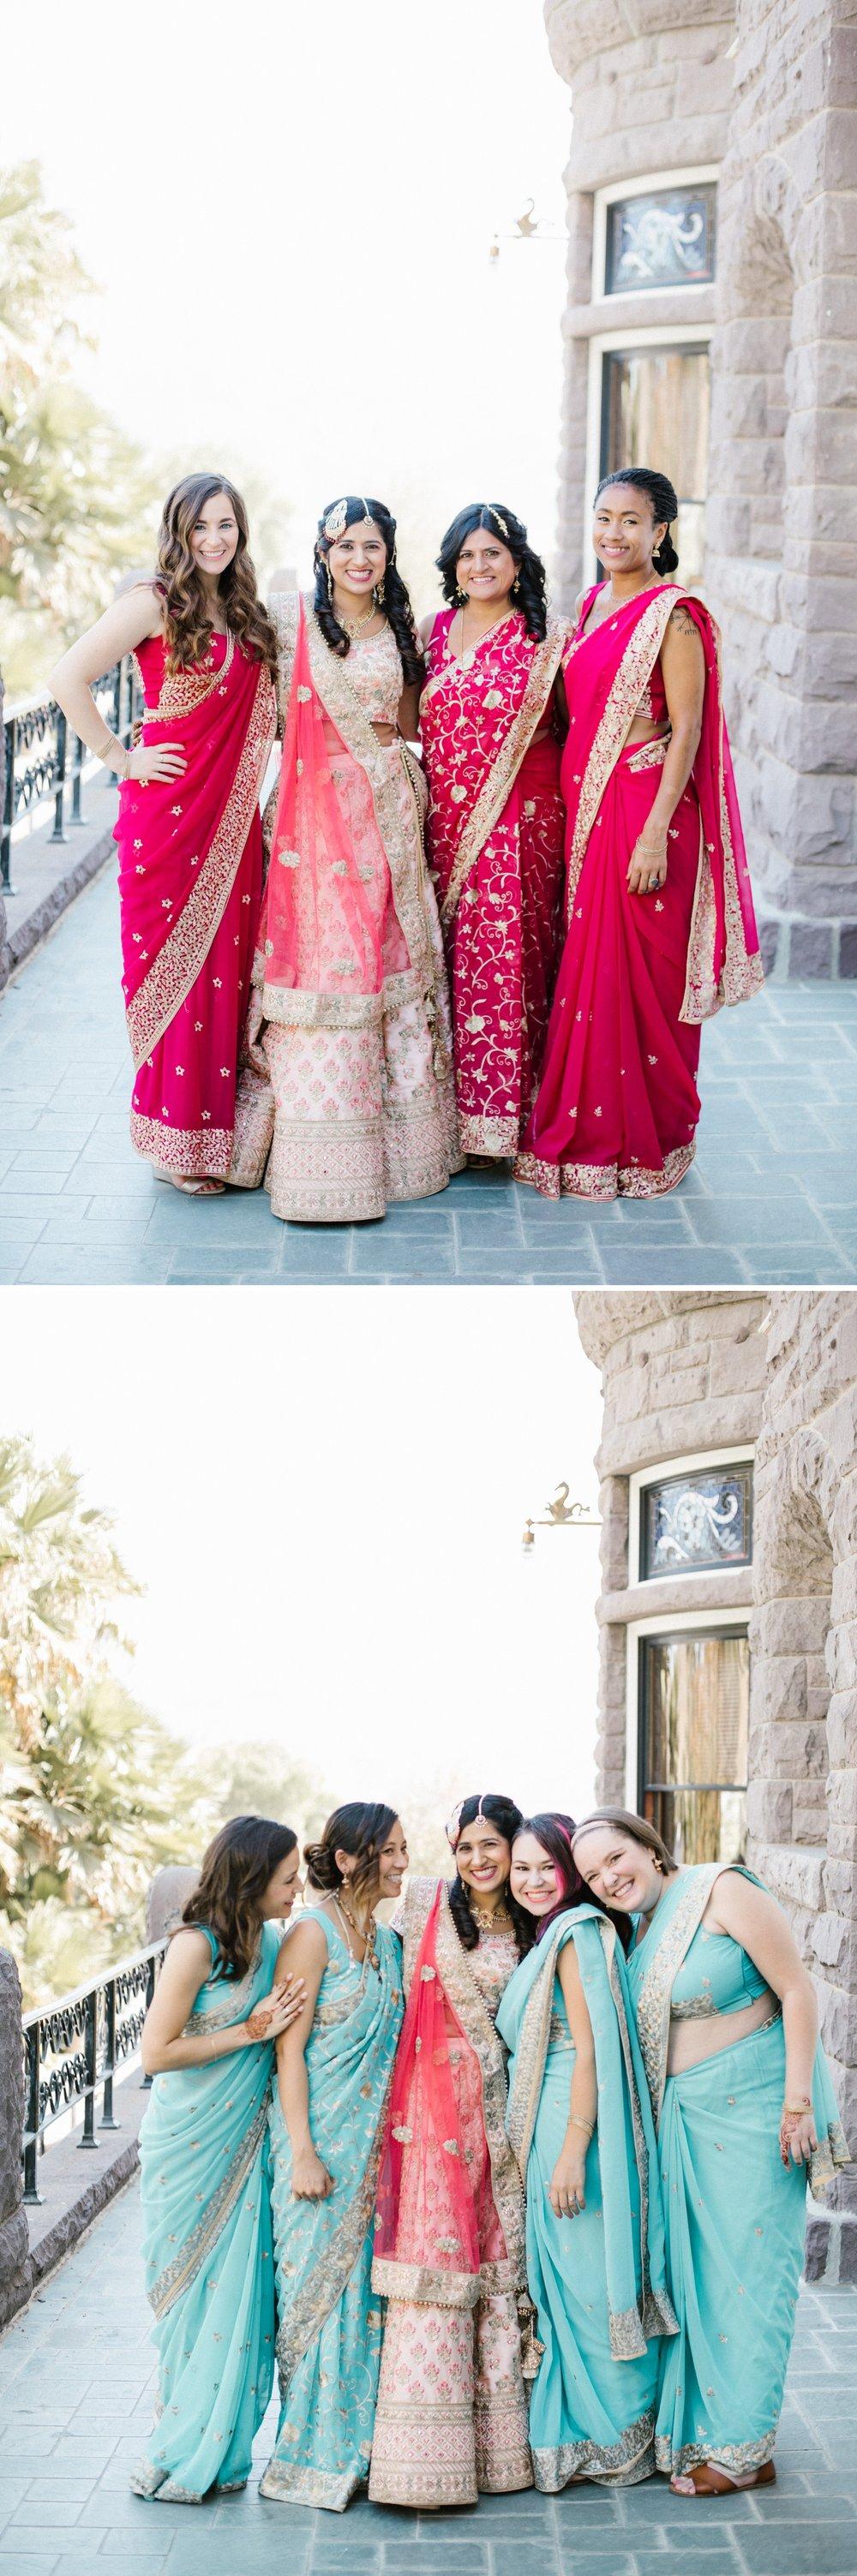 Newhall Mansion Wedding_0021.jpg